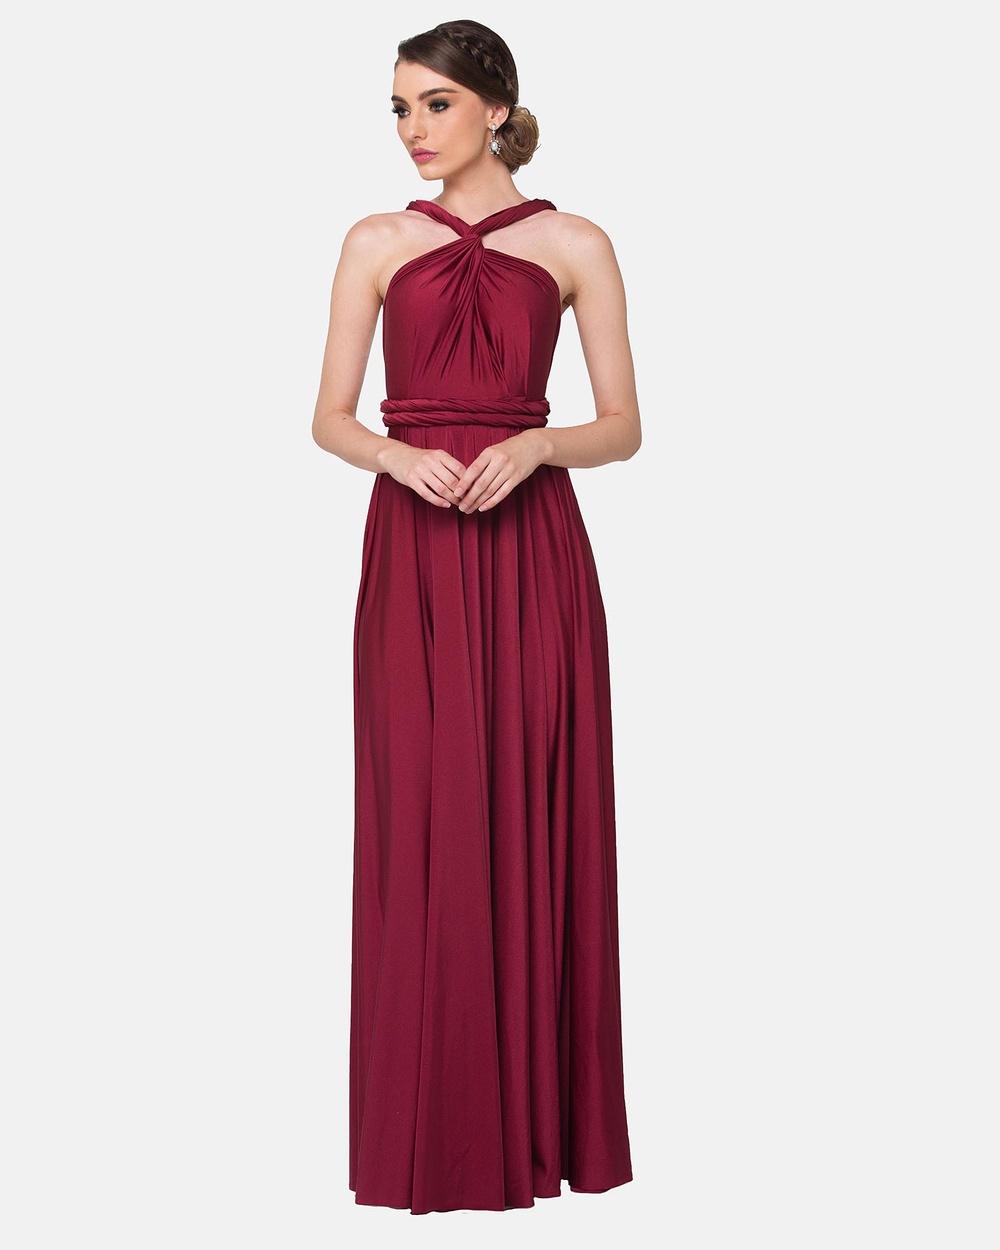 Tania Olsen Designs Wrap Dress Bridesmaid Dresses Merlot Wrap Dress